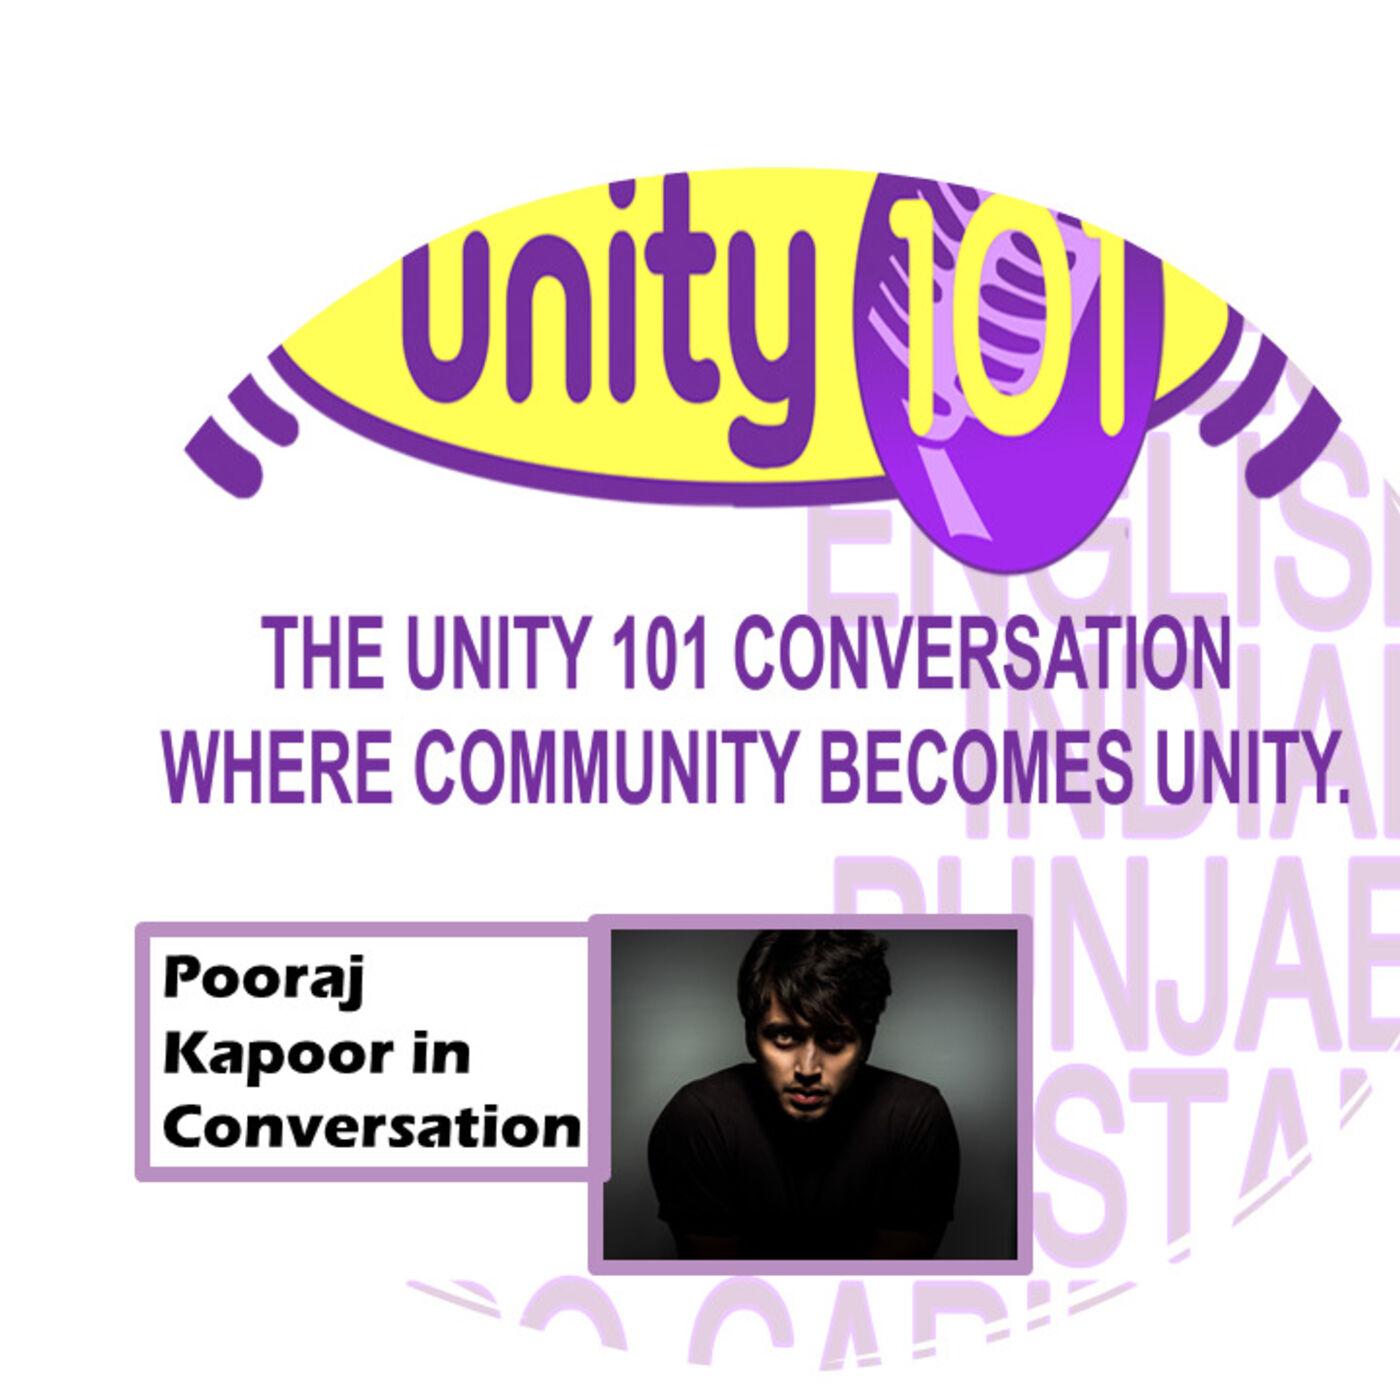 Pooraj Kapoor in Conversation